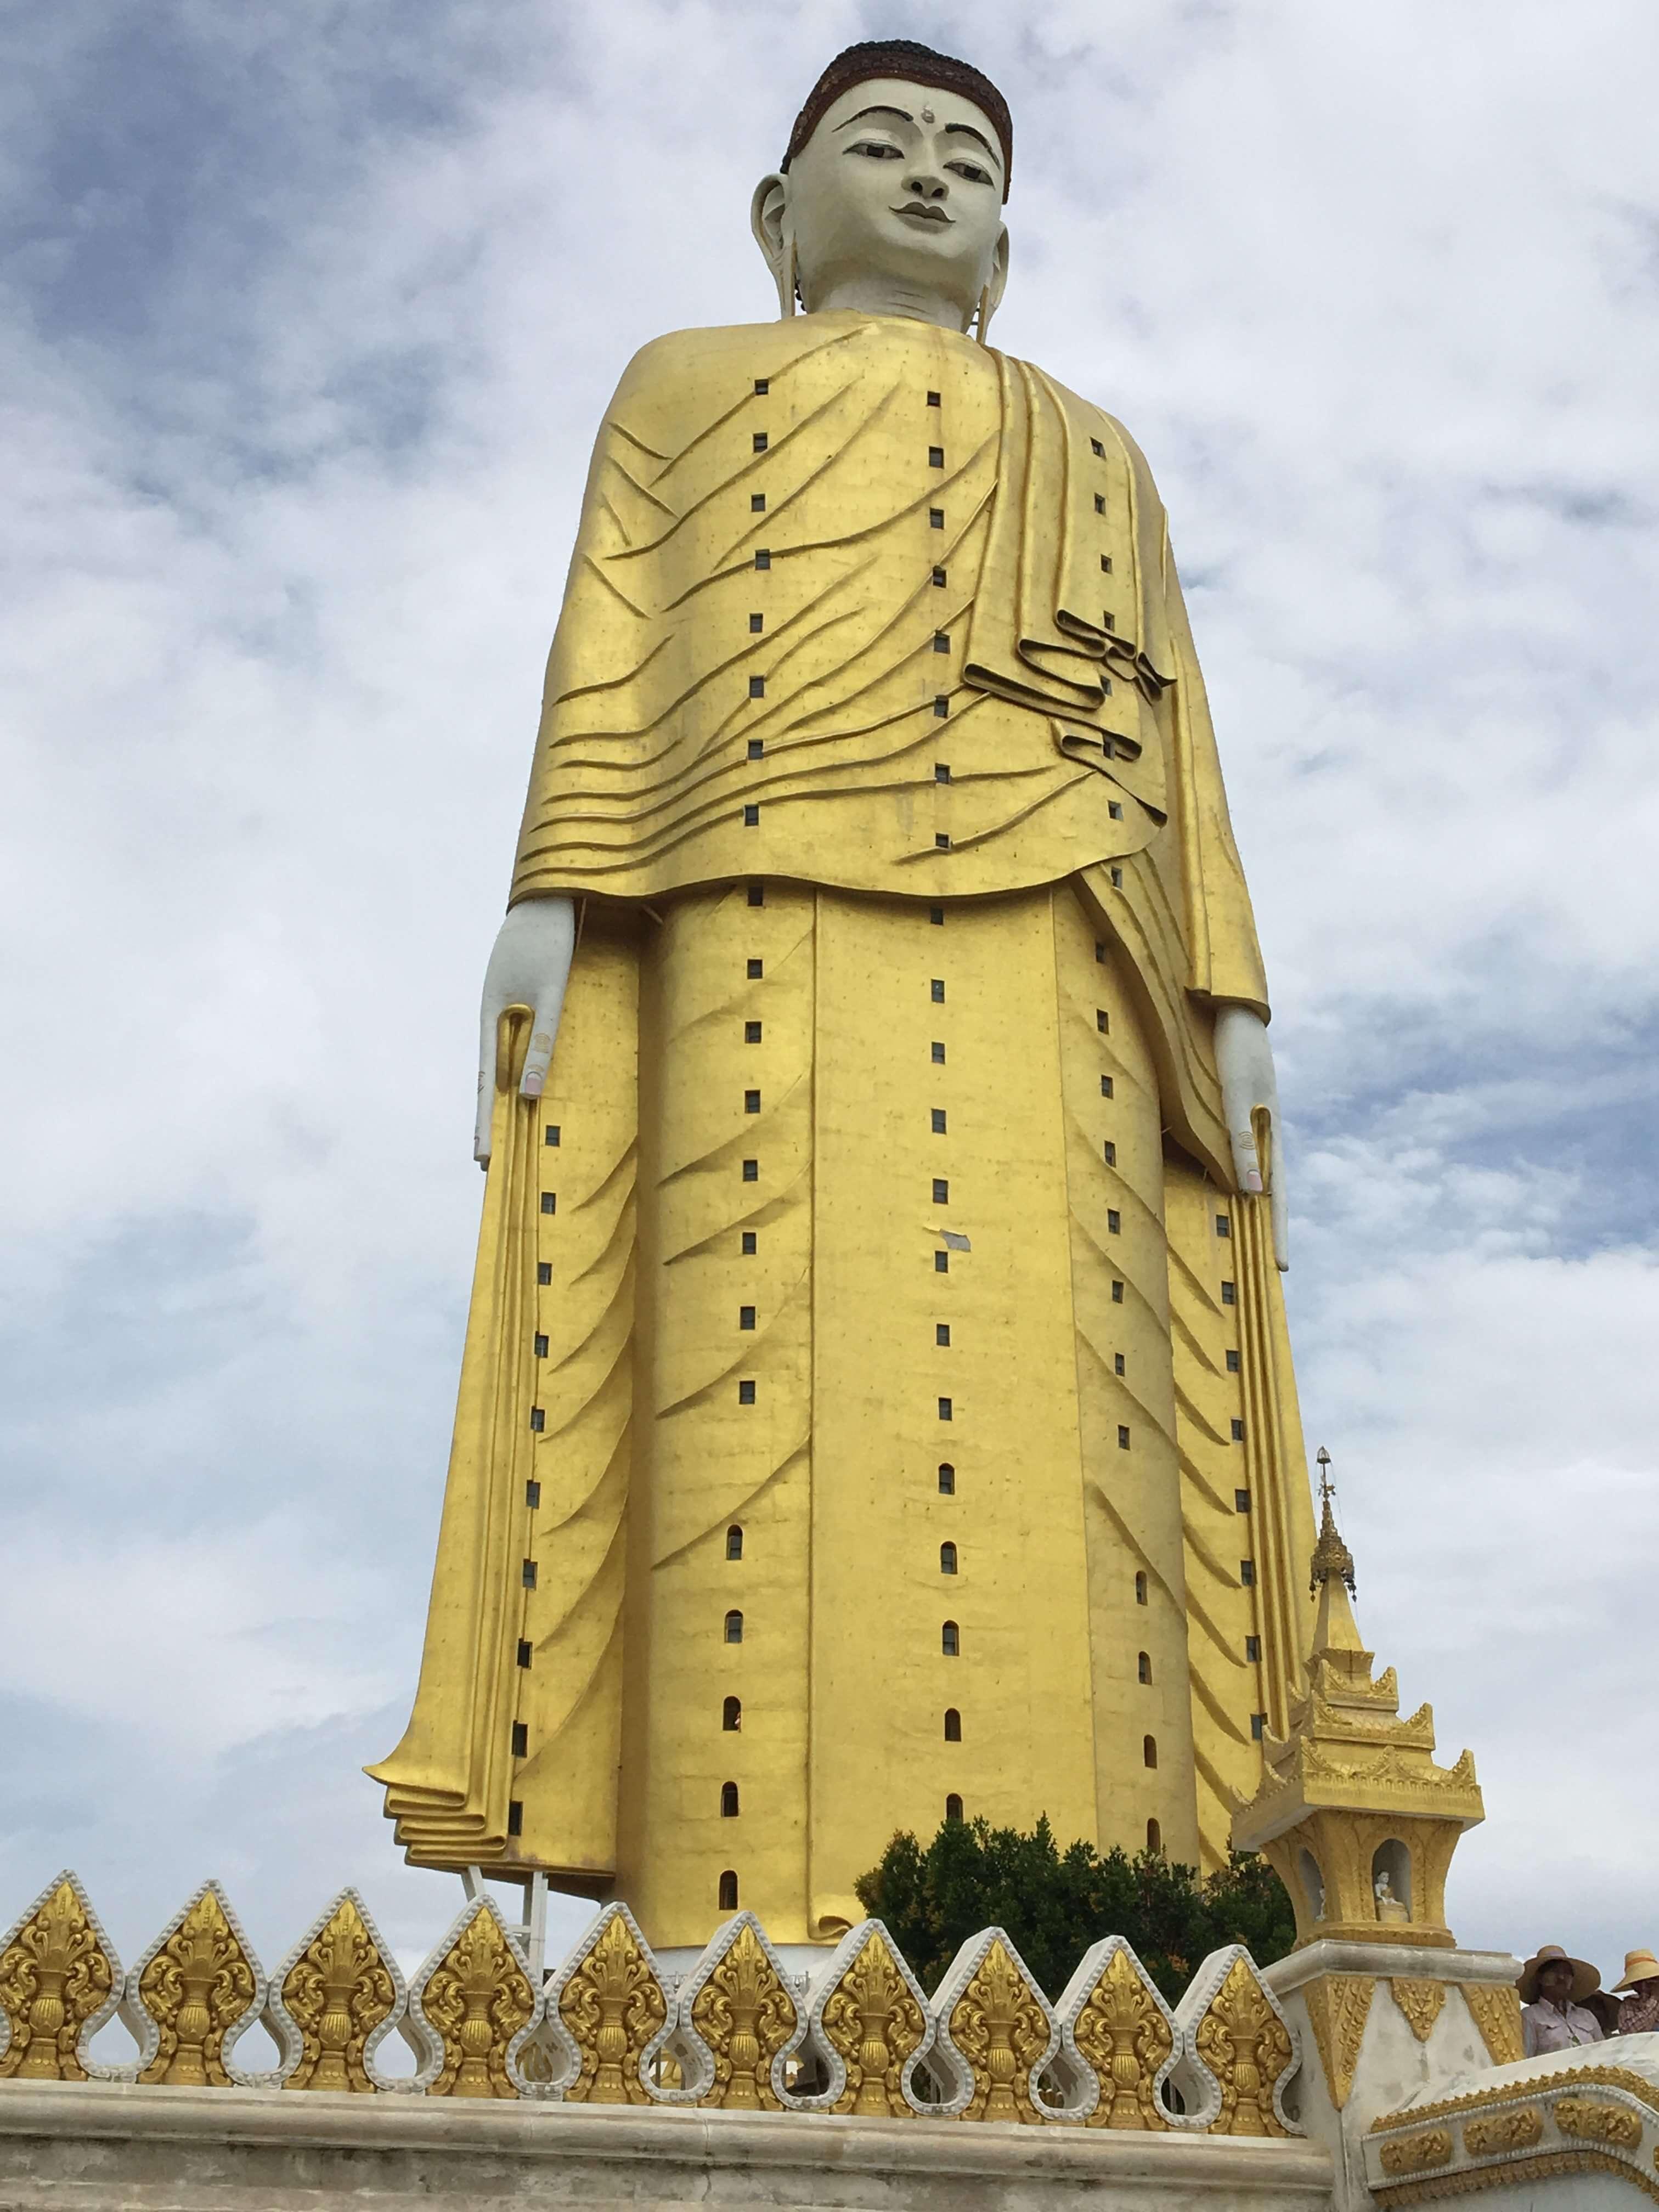 Maha Bodhi Tahtaung at Sagaing province, Myanmar